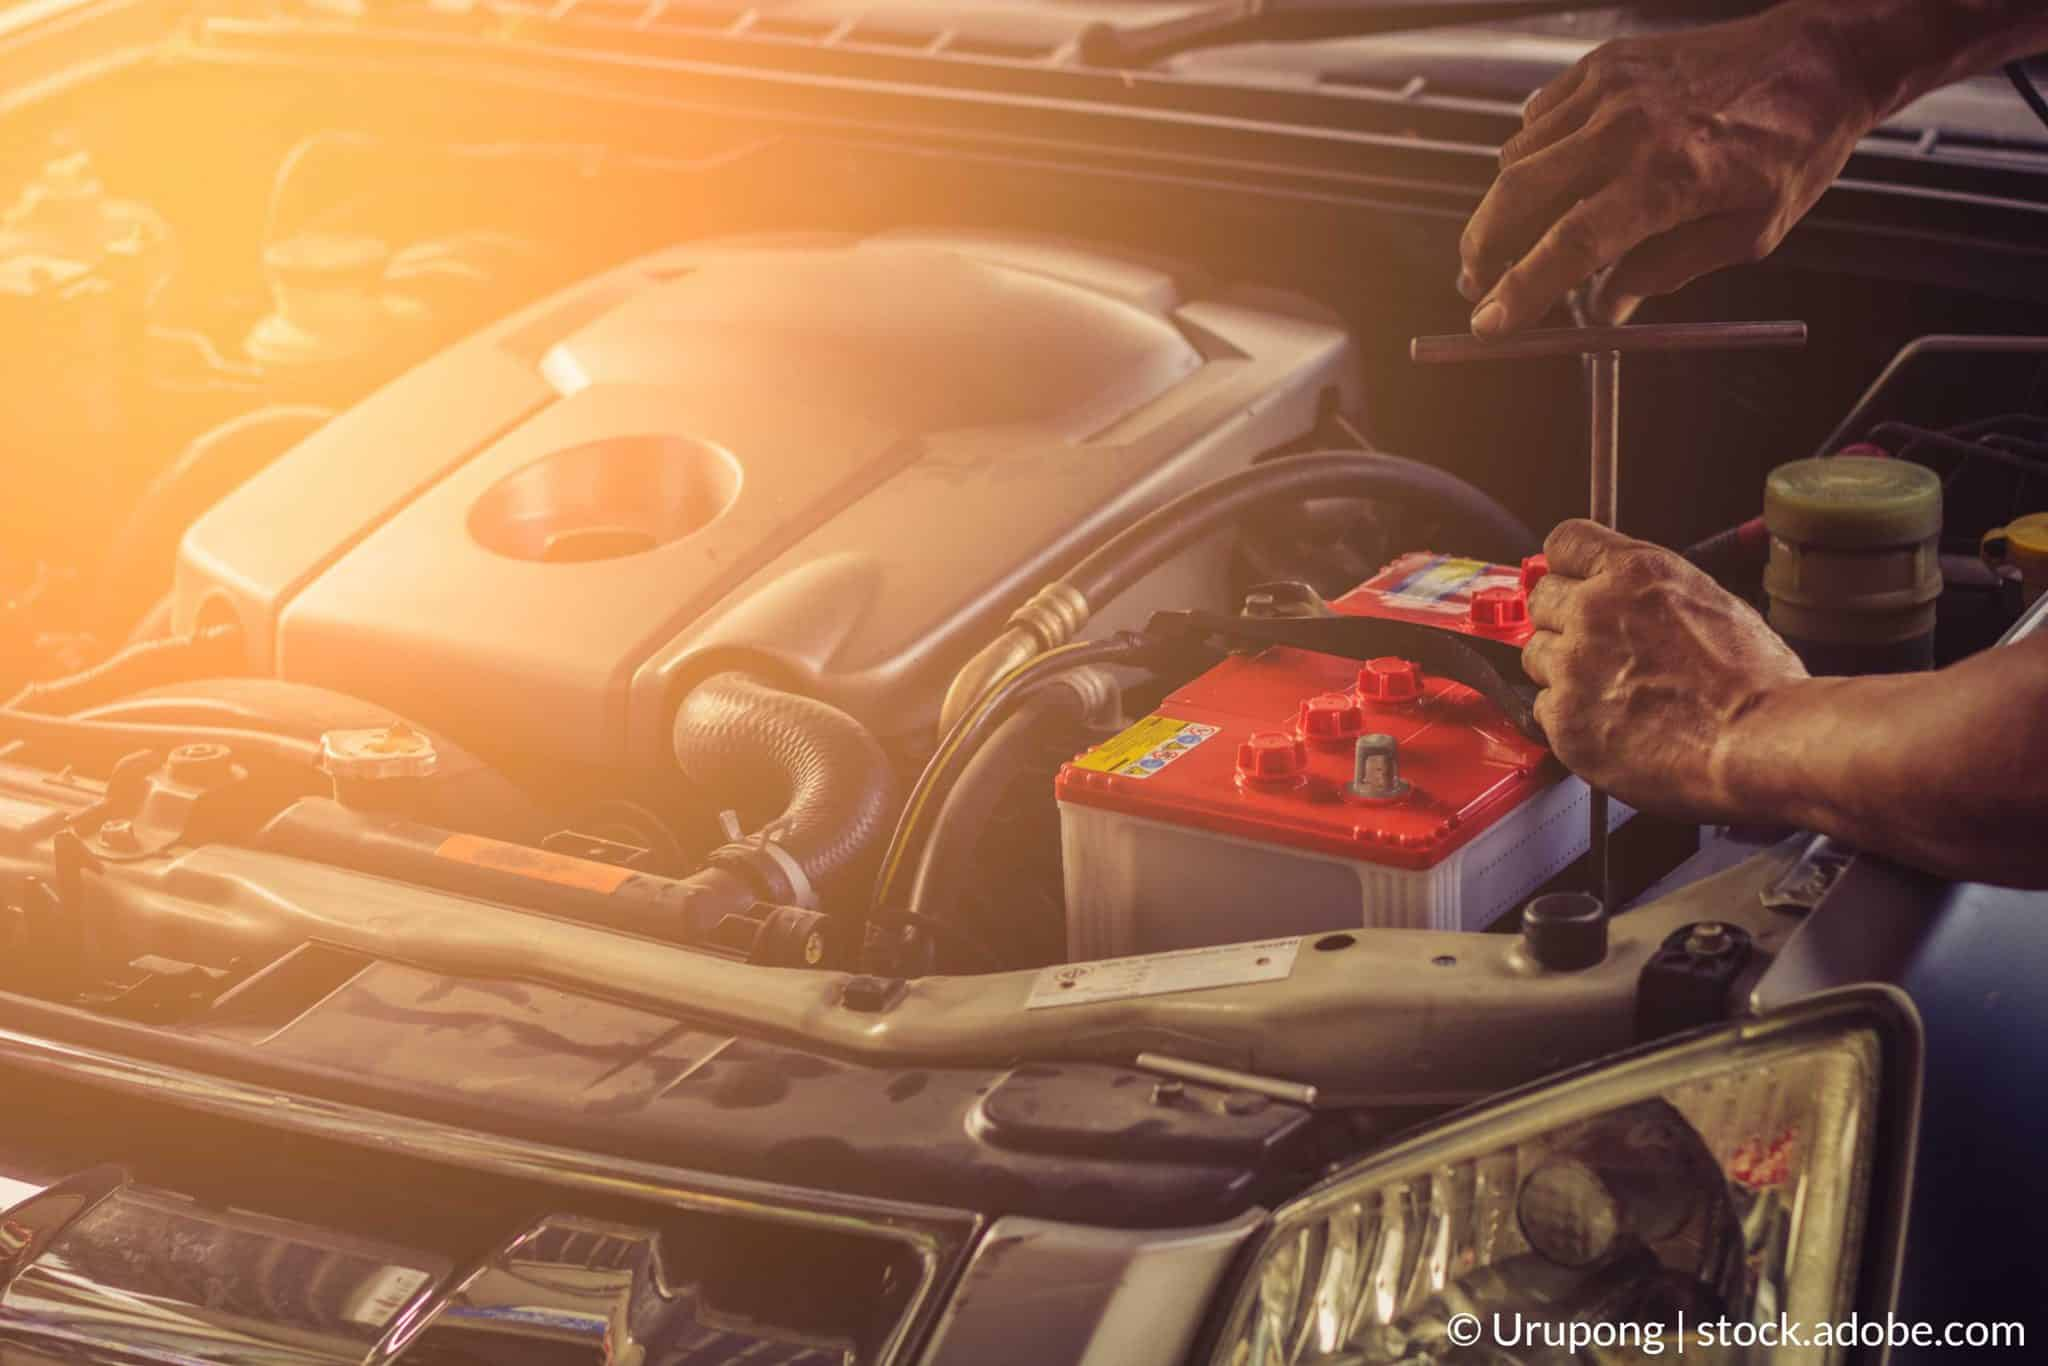 cum sa schimbi bateria masinii